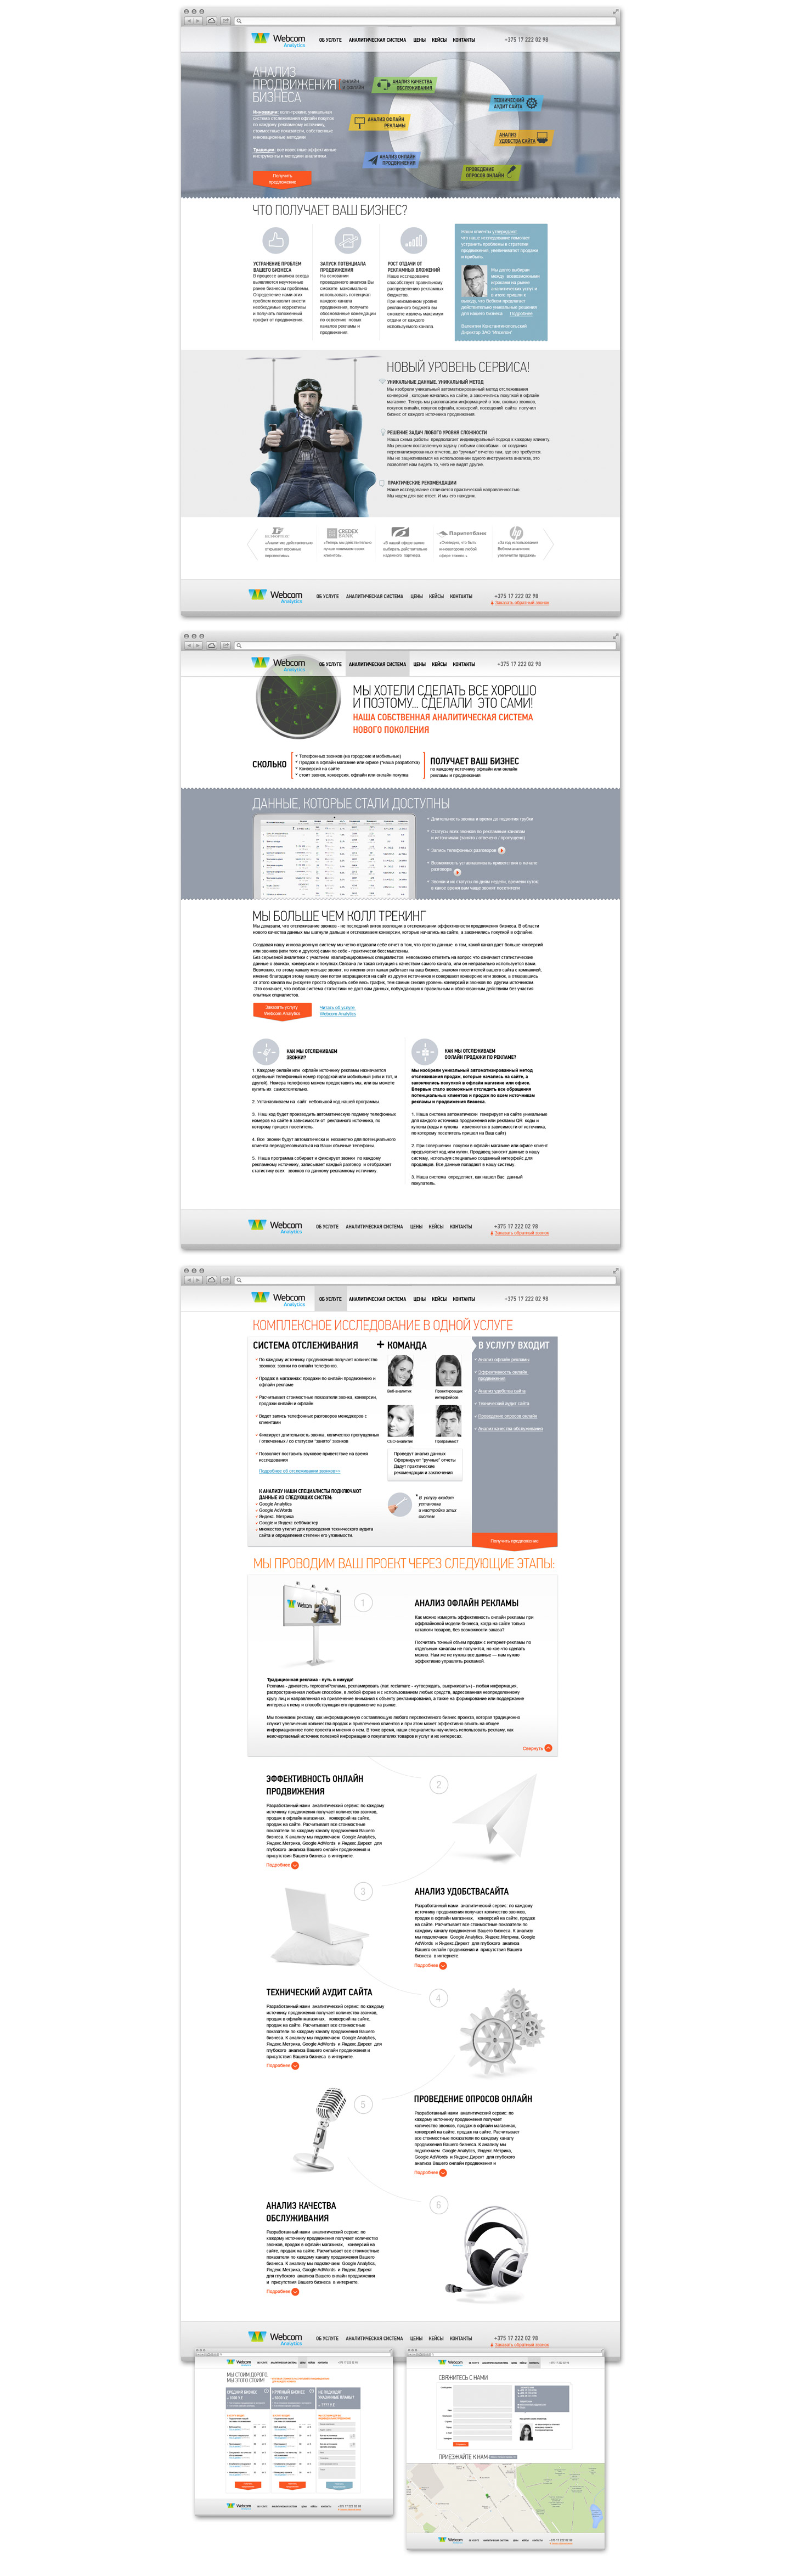 Вебком Аналитикс. Дизайн сайта для аналитического сервиса.